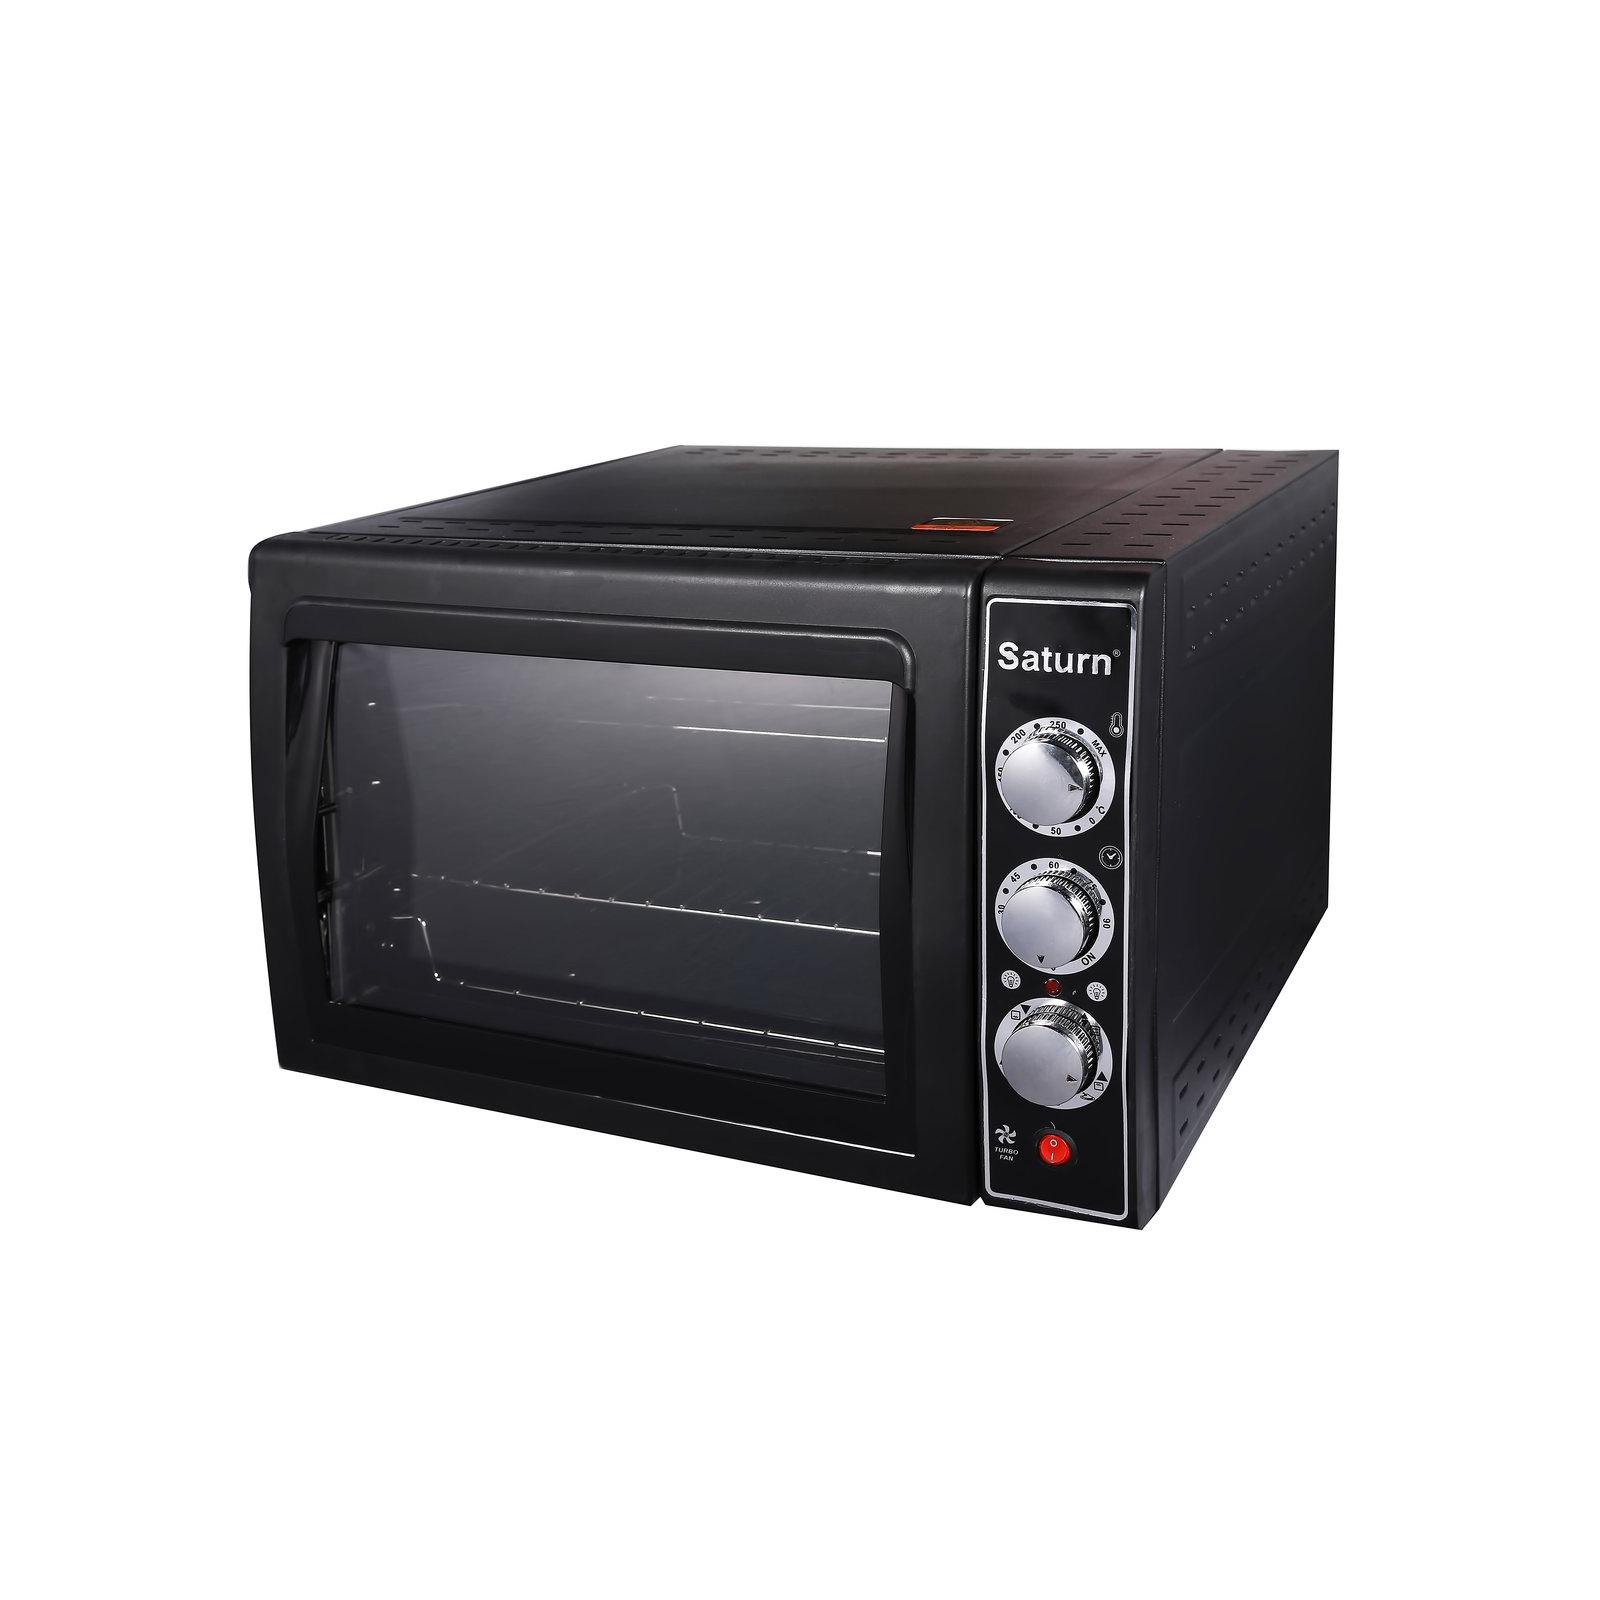 Электропечь SATURN ST-EC 1078 Black (ST-EC1078 Black)